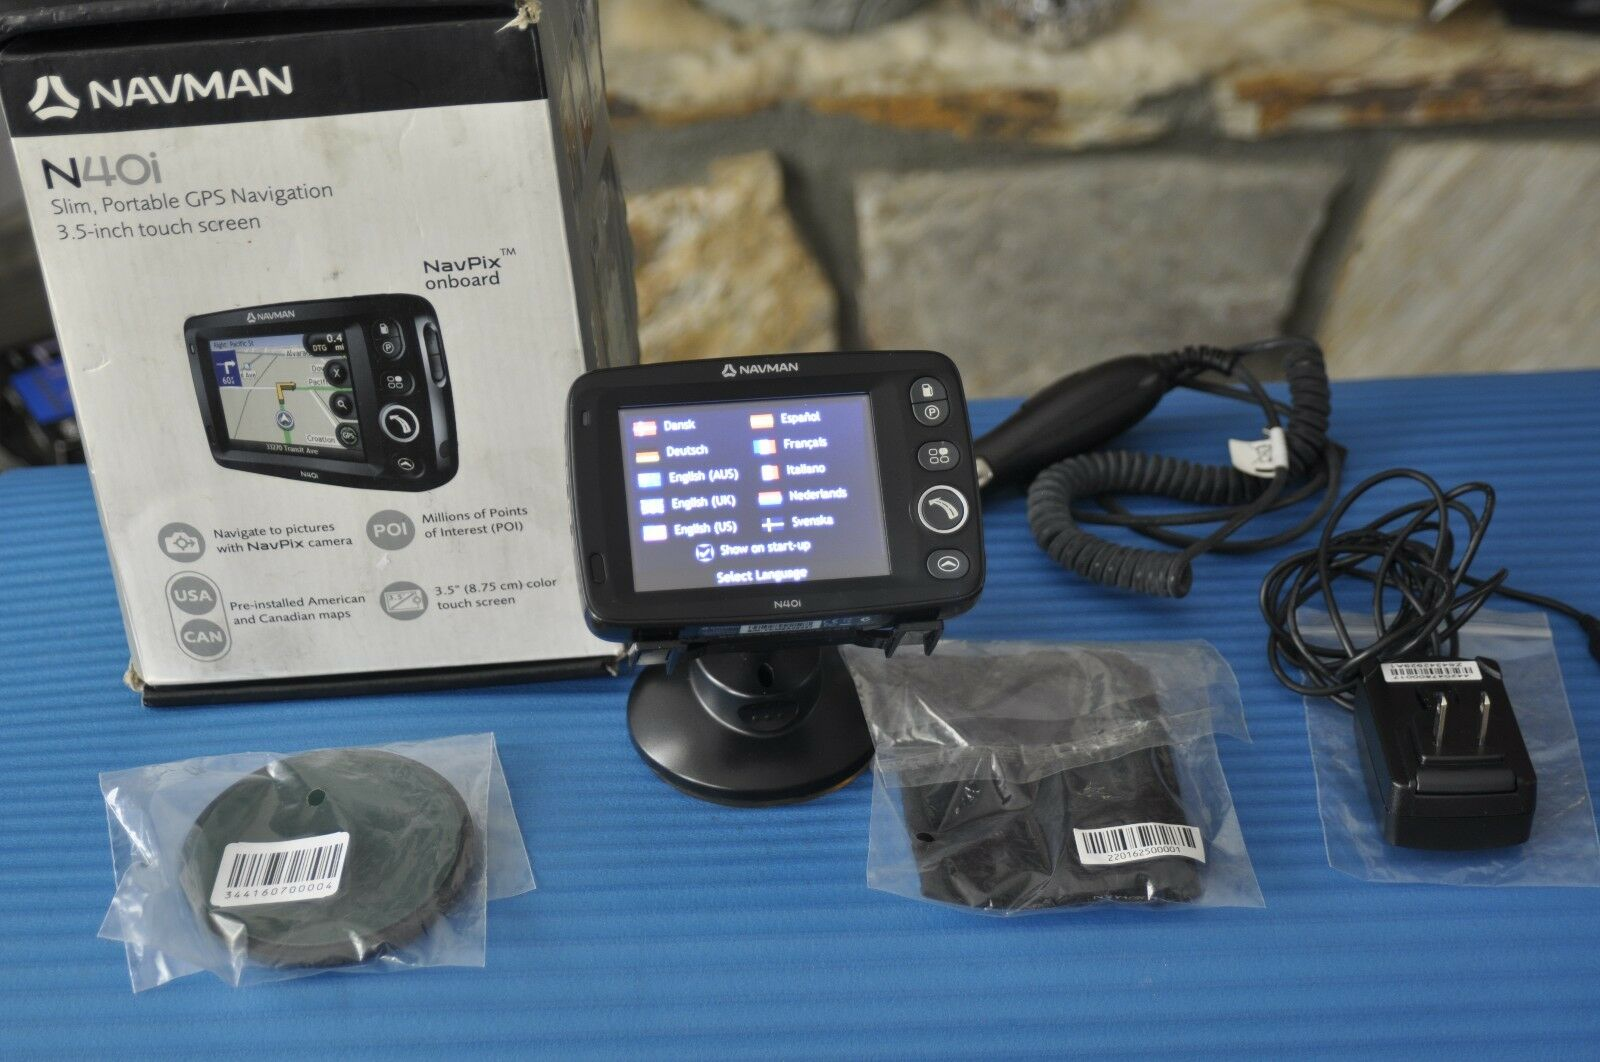 Navman N40i Slim Portable GPS Navigation System Unit with Box